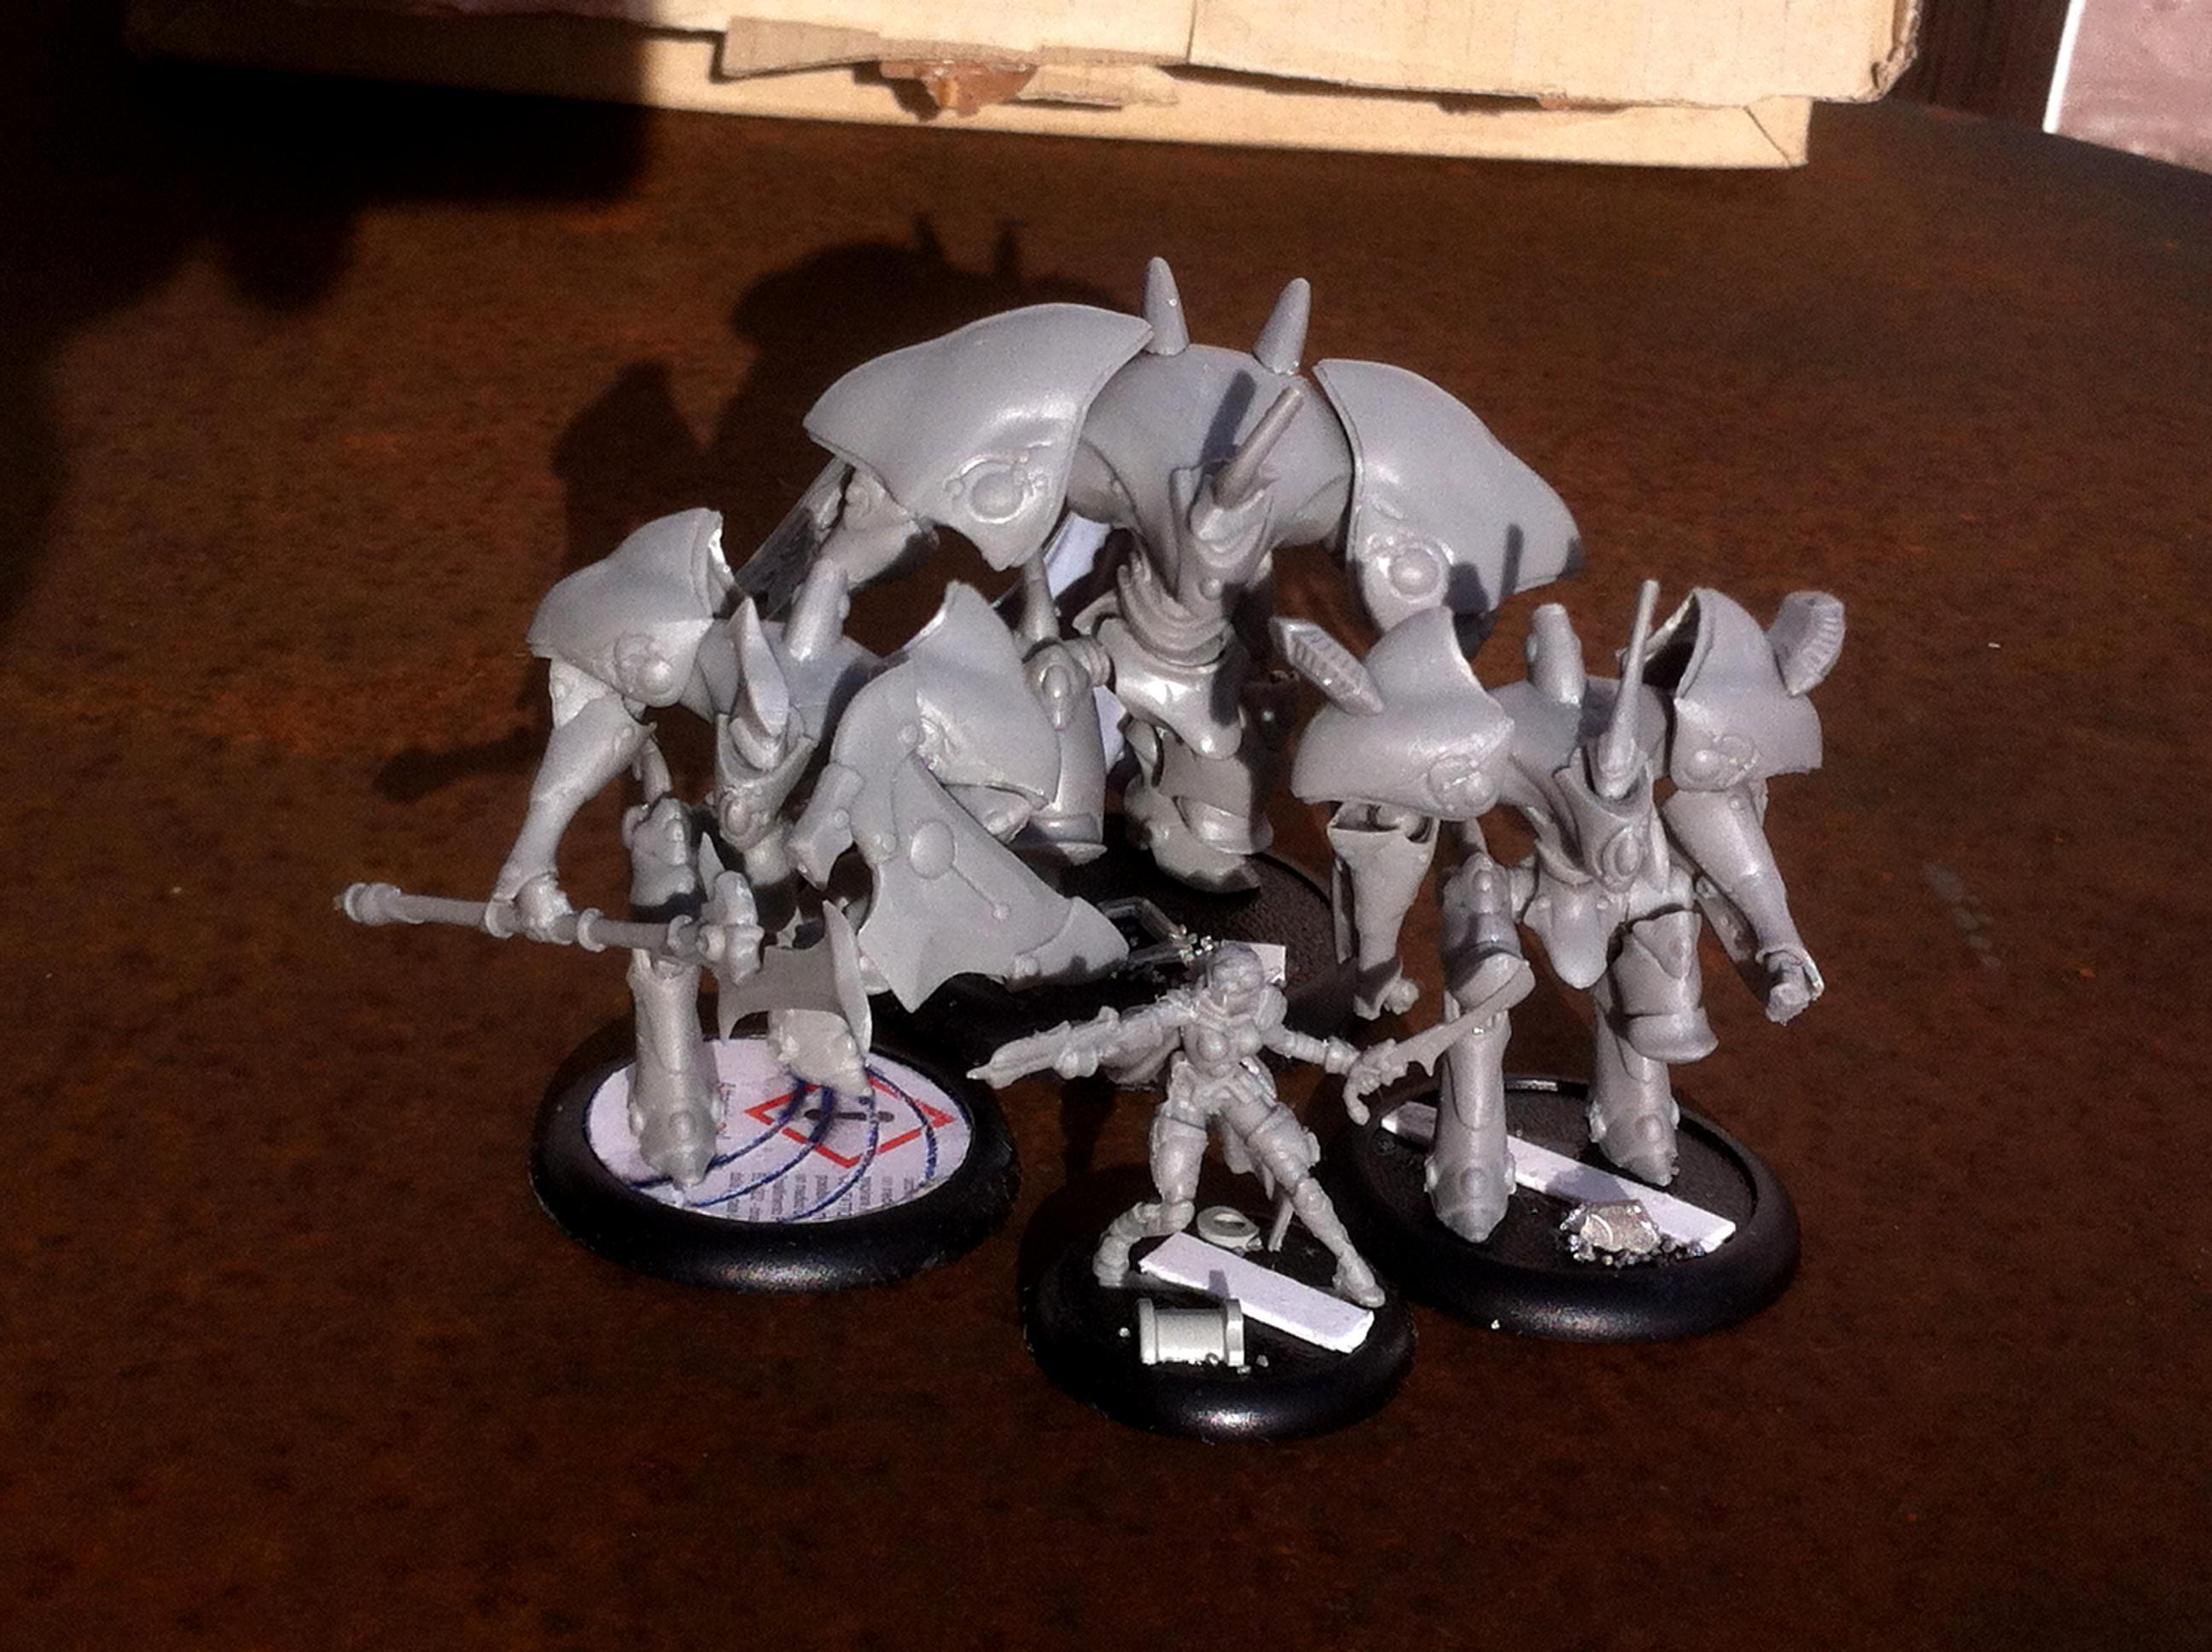 Bragon, Elves, Everblight, Legion, Nyss, Retribution, Scyrah, Shredder, Warbeast, Warmachine